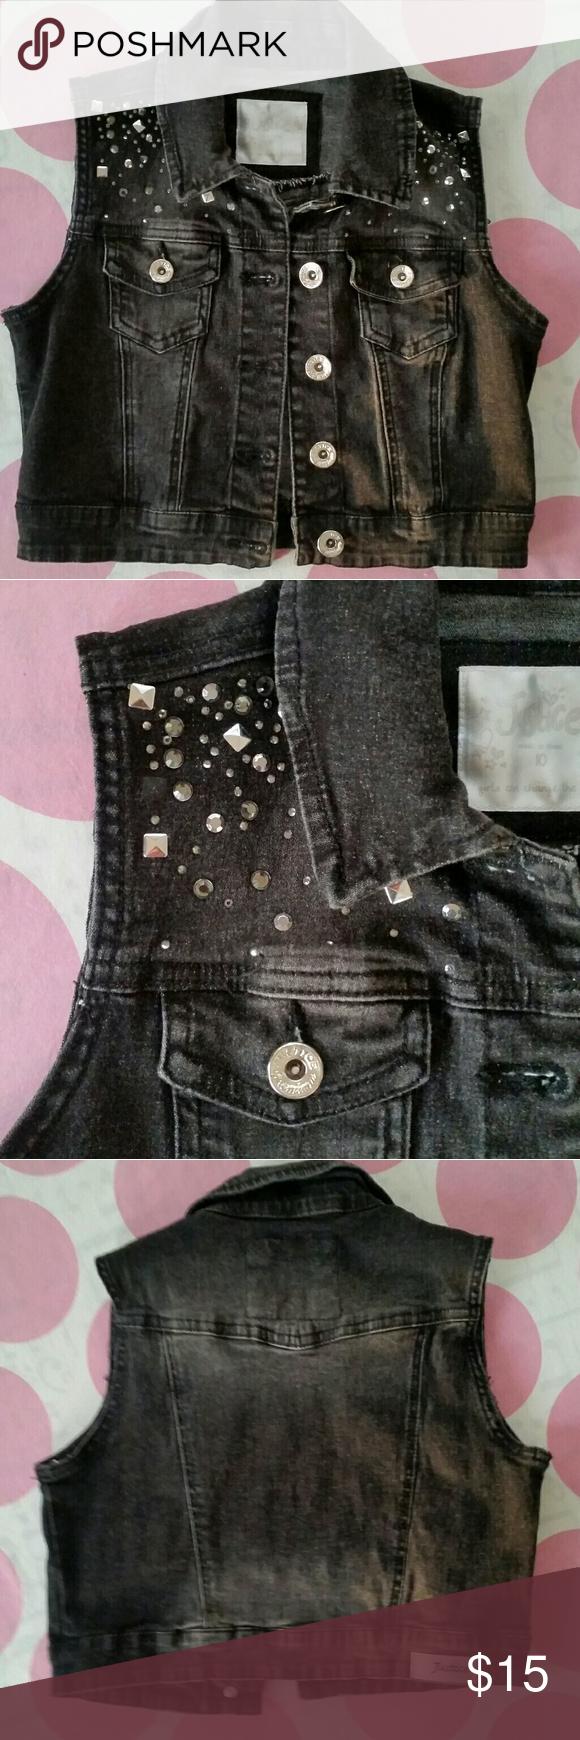 b93fde3f84 JUSTICE Girls Black Jean Vest